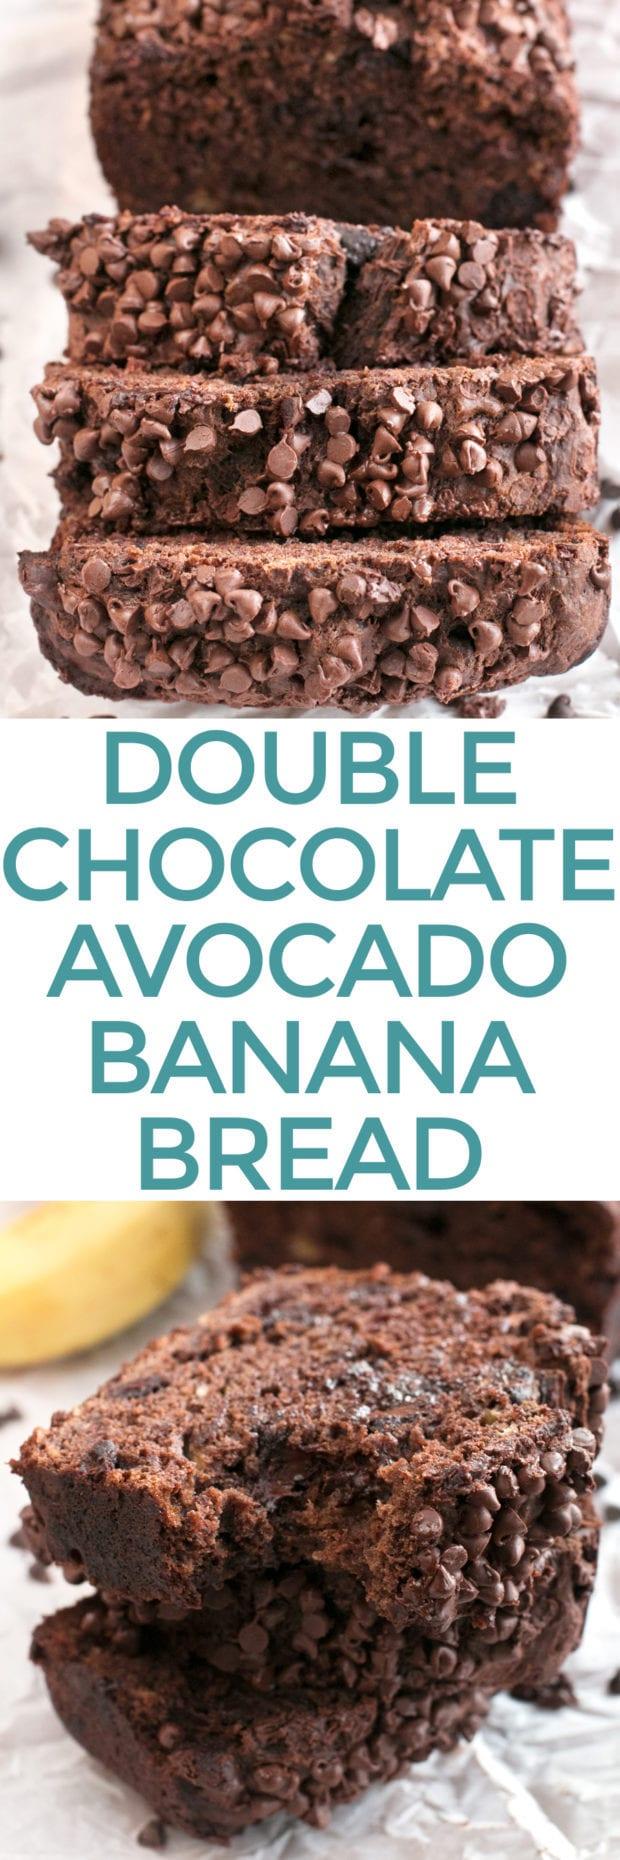 Double Chocolate Avocado Banana Bread